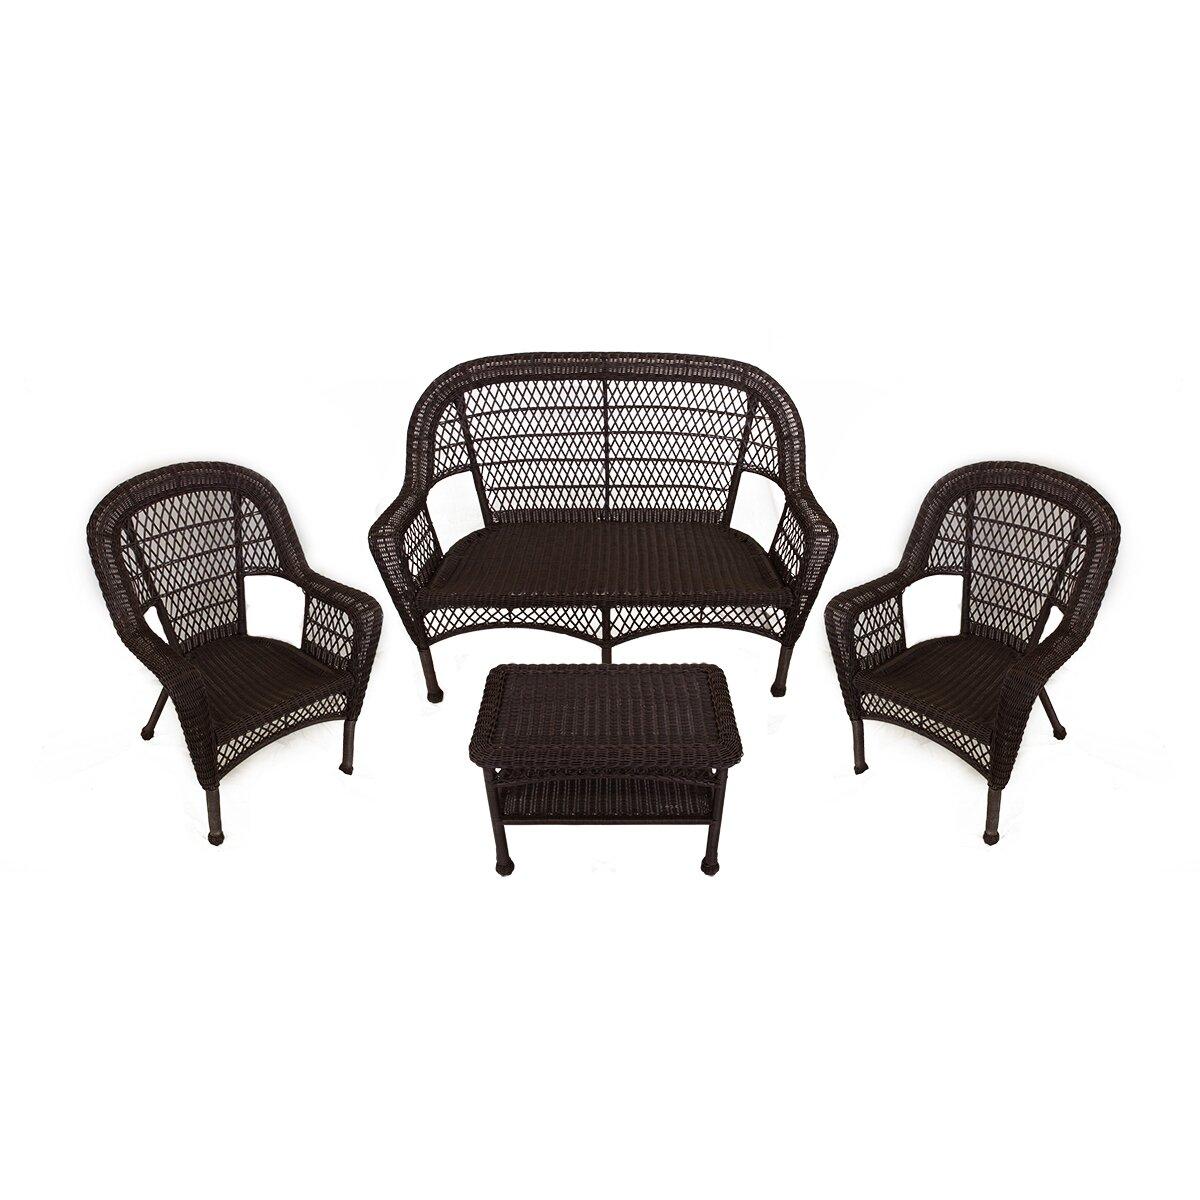 LB International 4 Piece Resin Wicker Patio Furniture Set